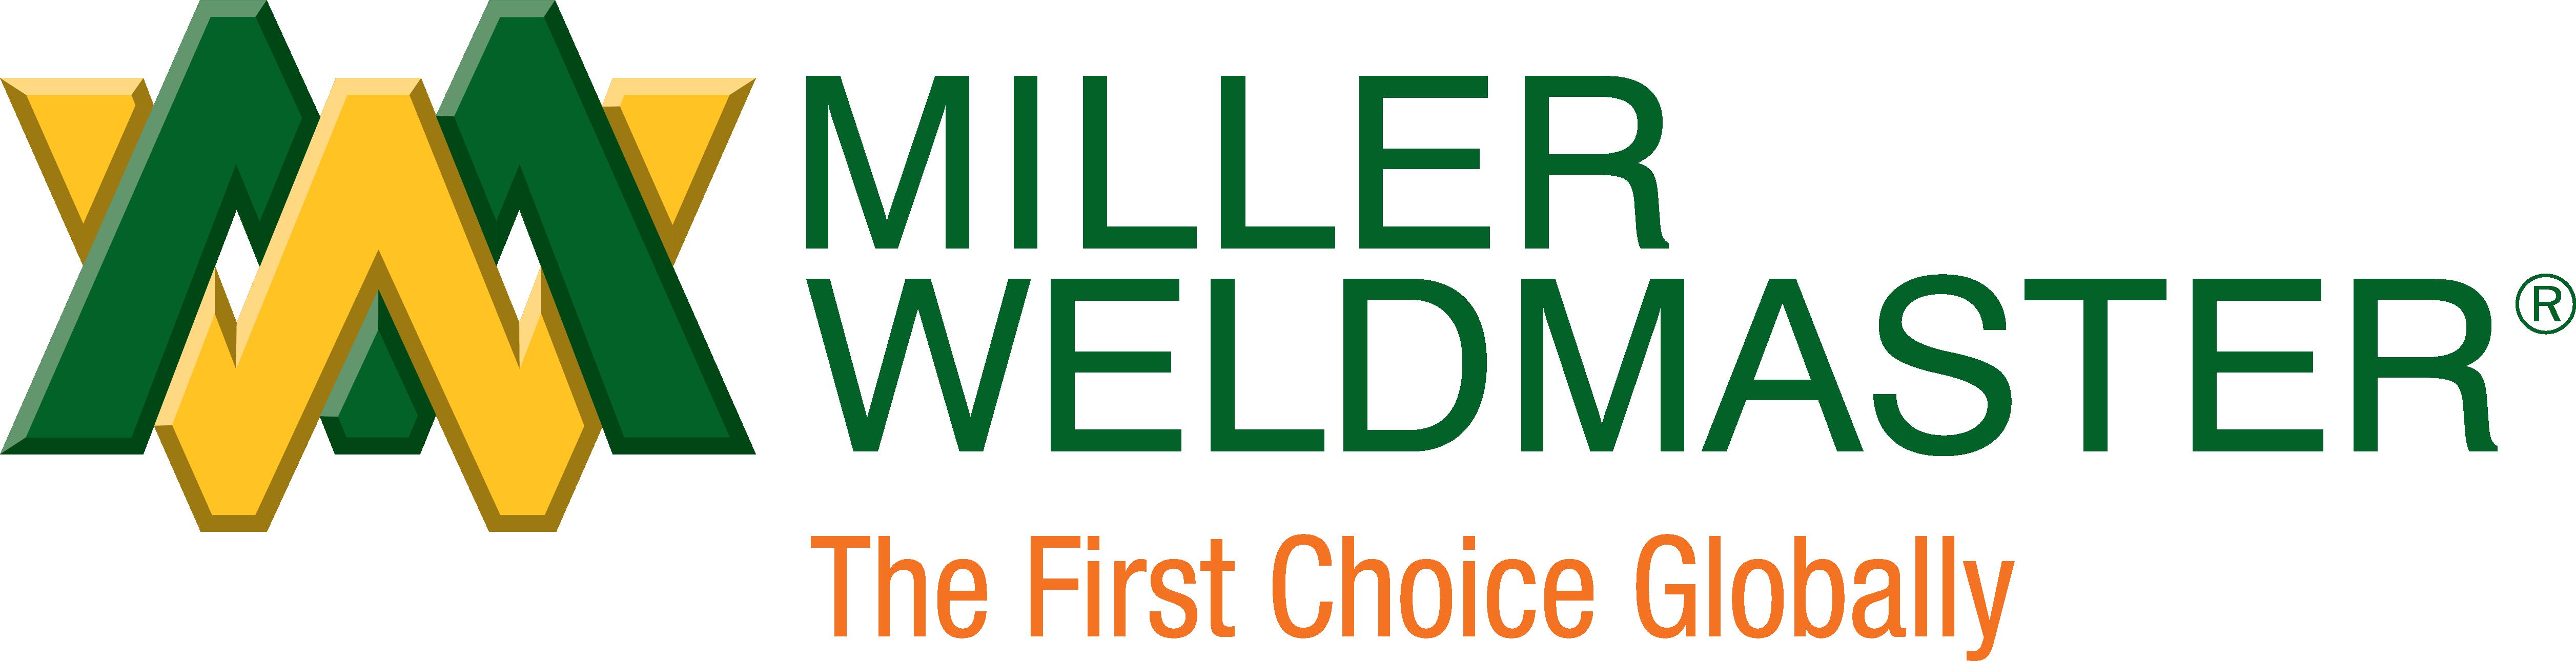 Miller Weldmaster 로고